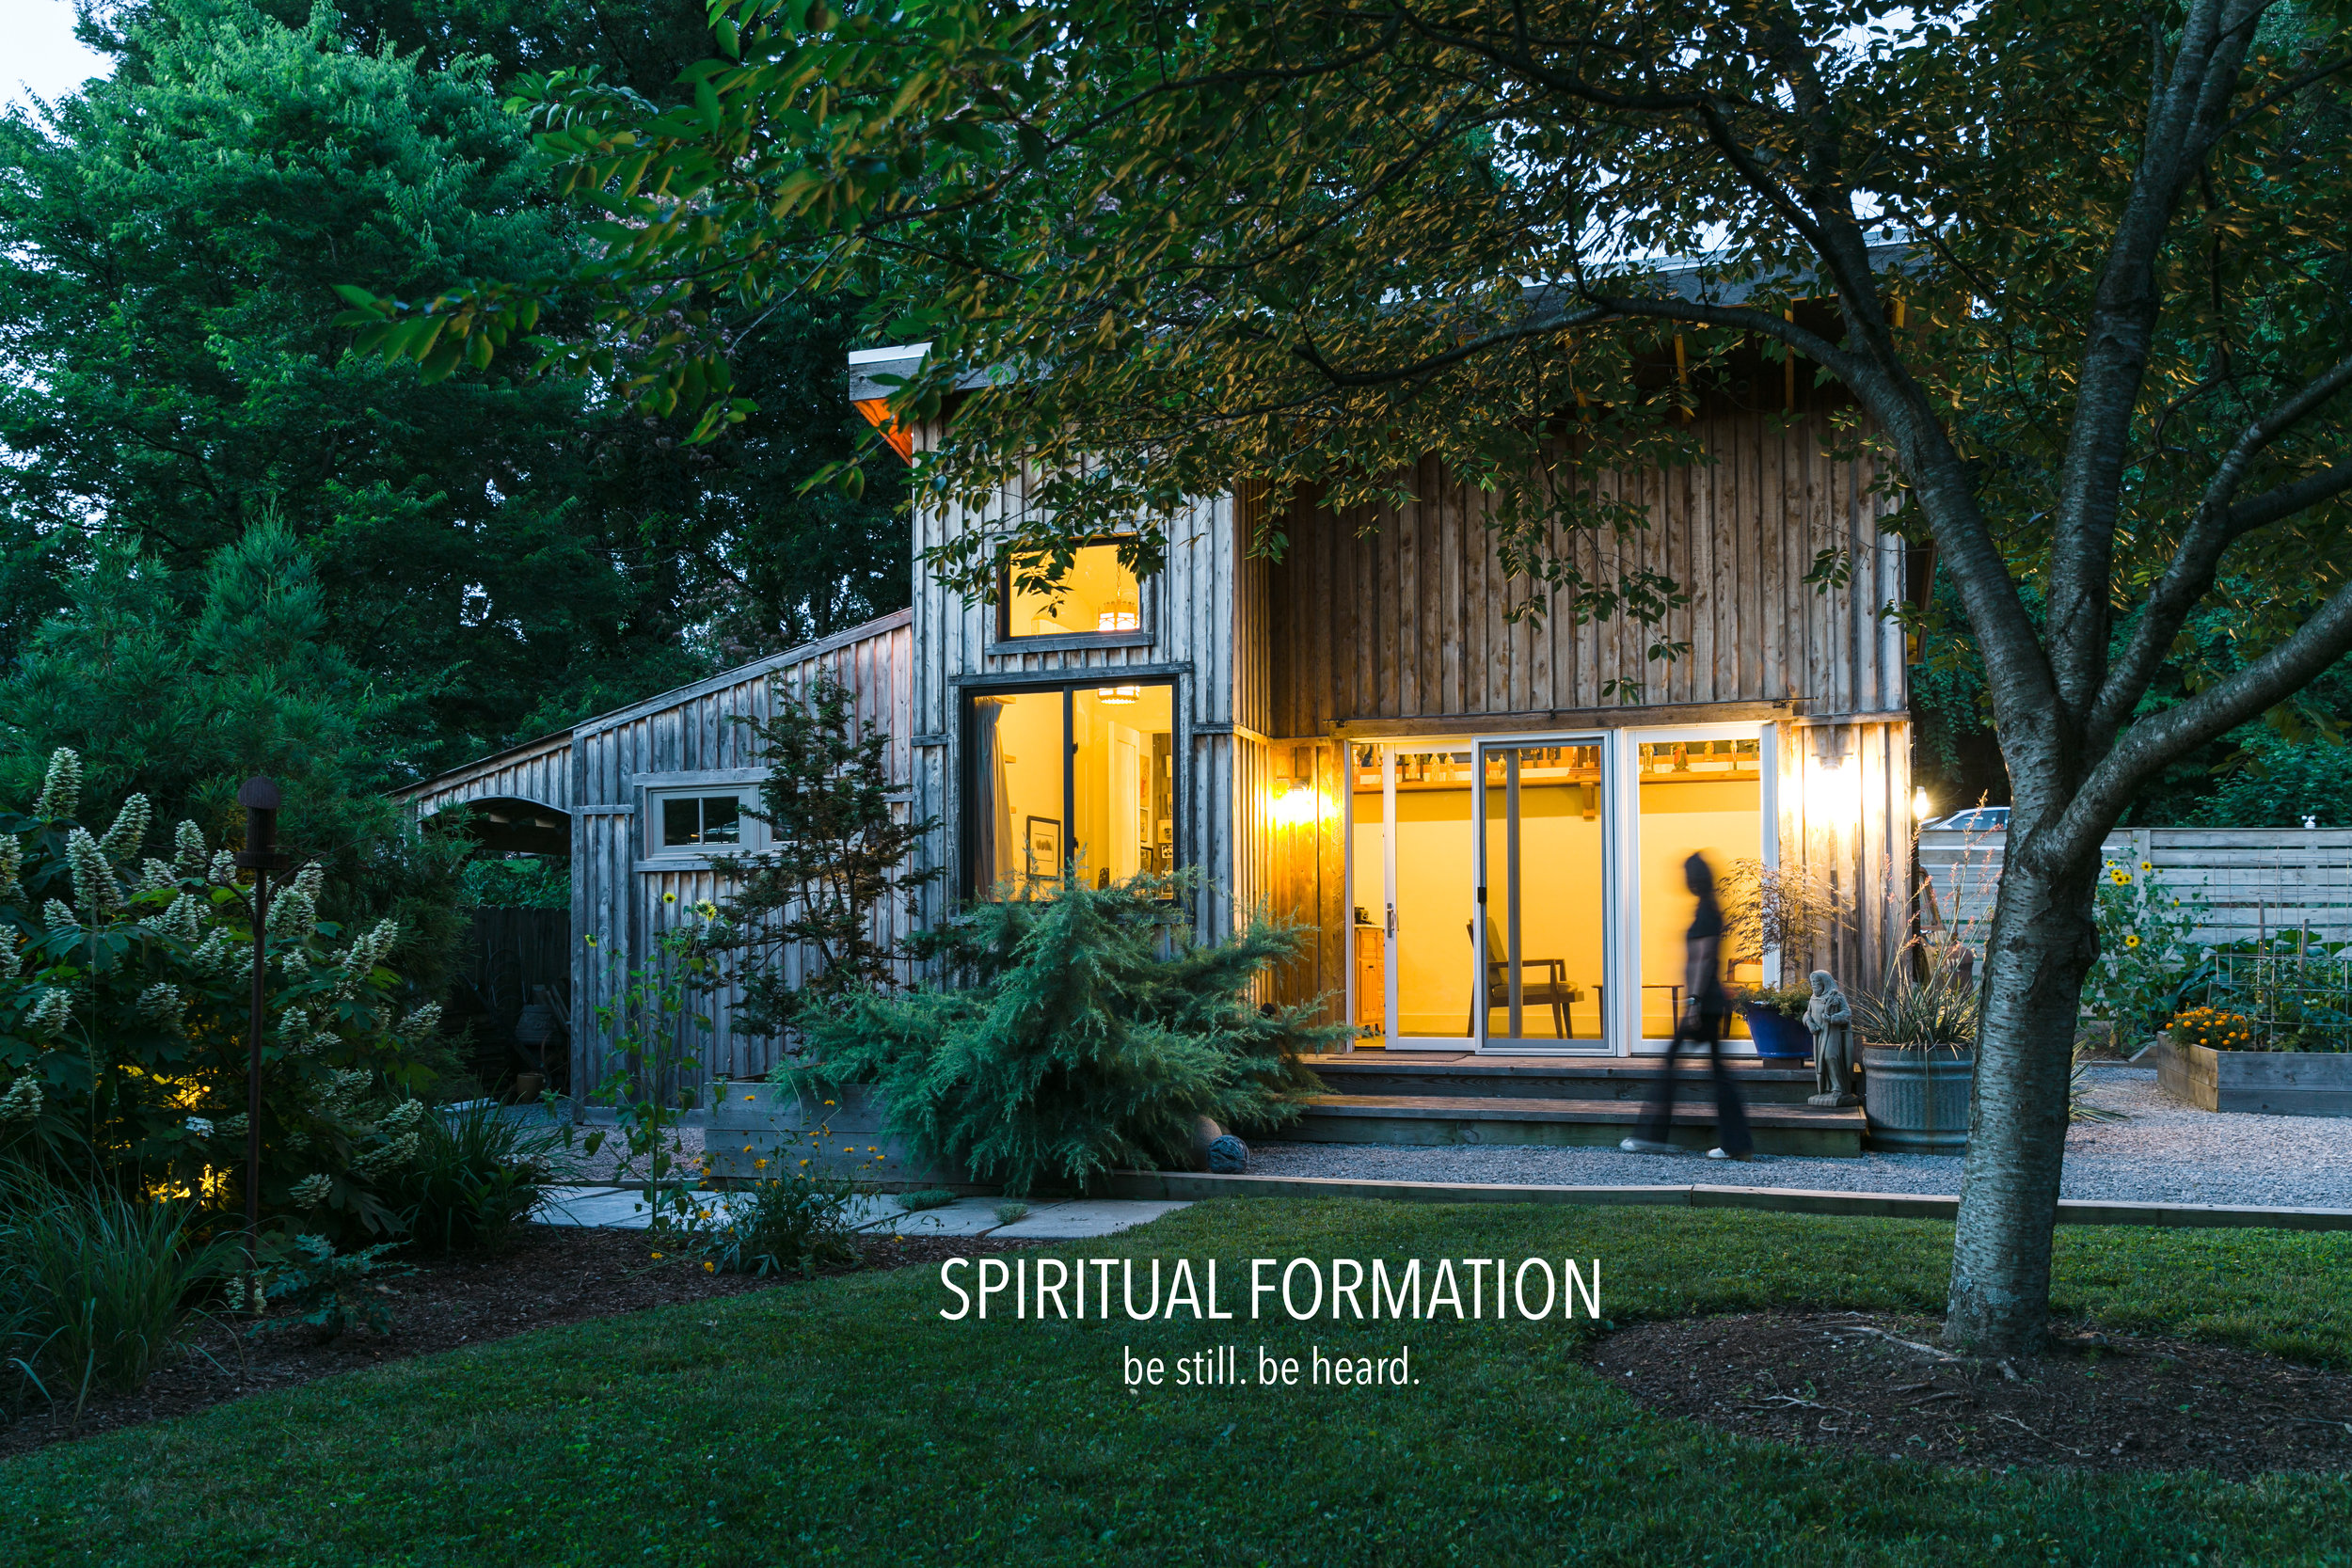 spiritualformation.jpg